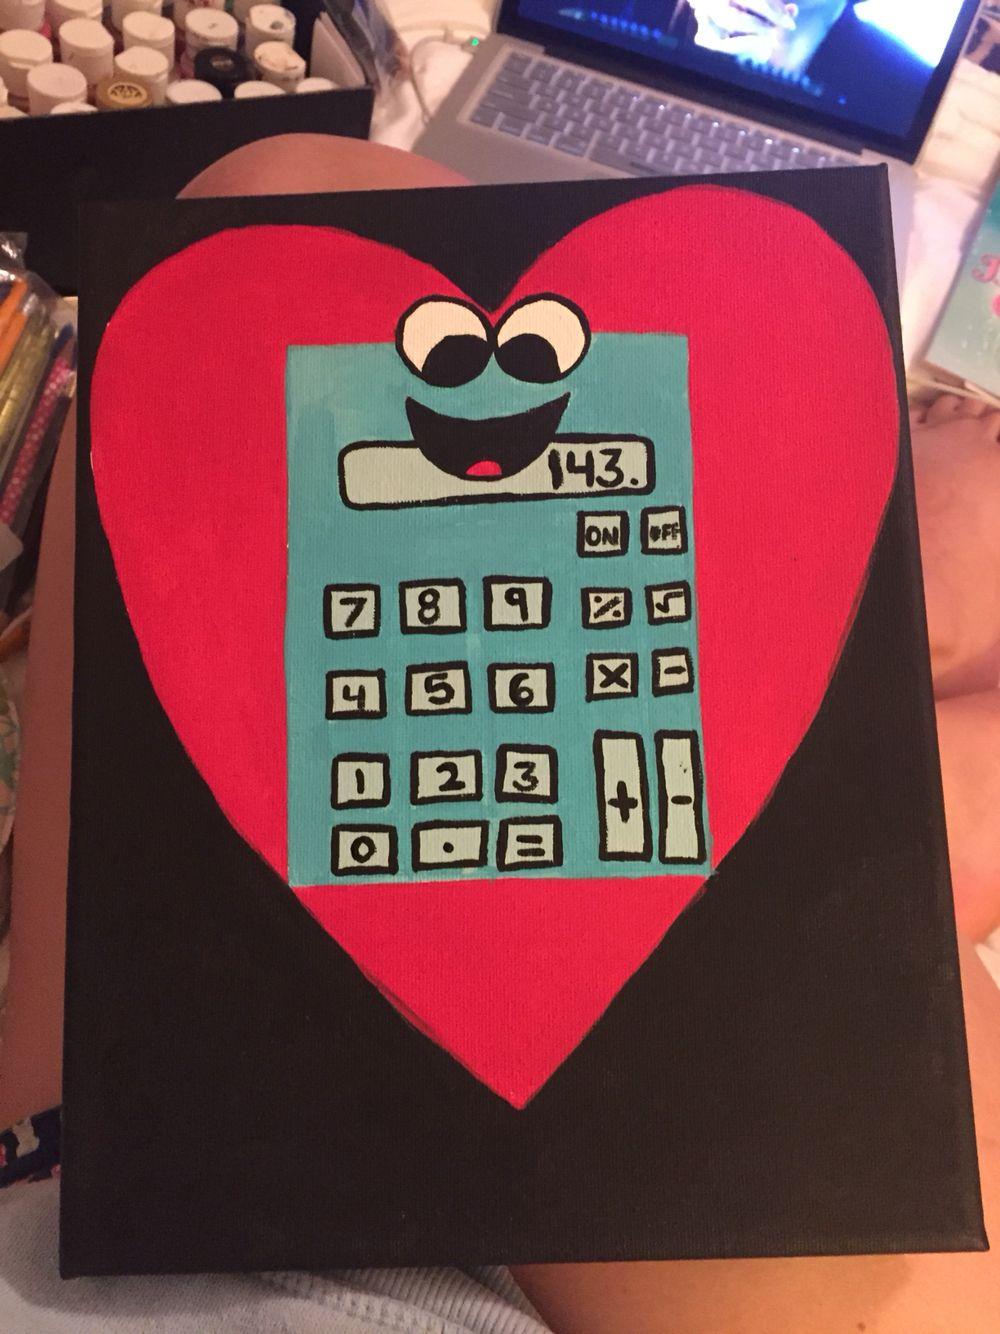 Calculator love Calculator, Love